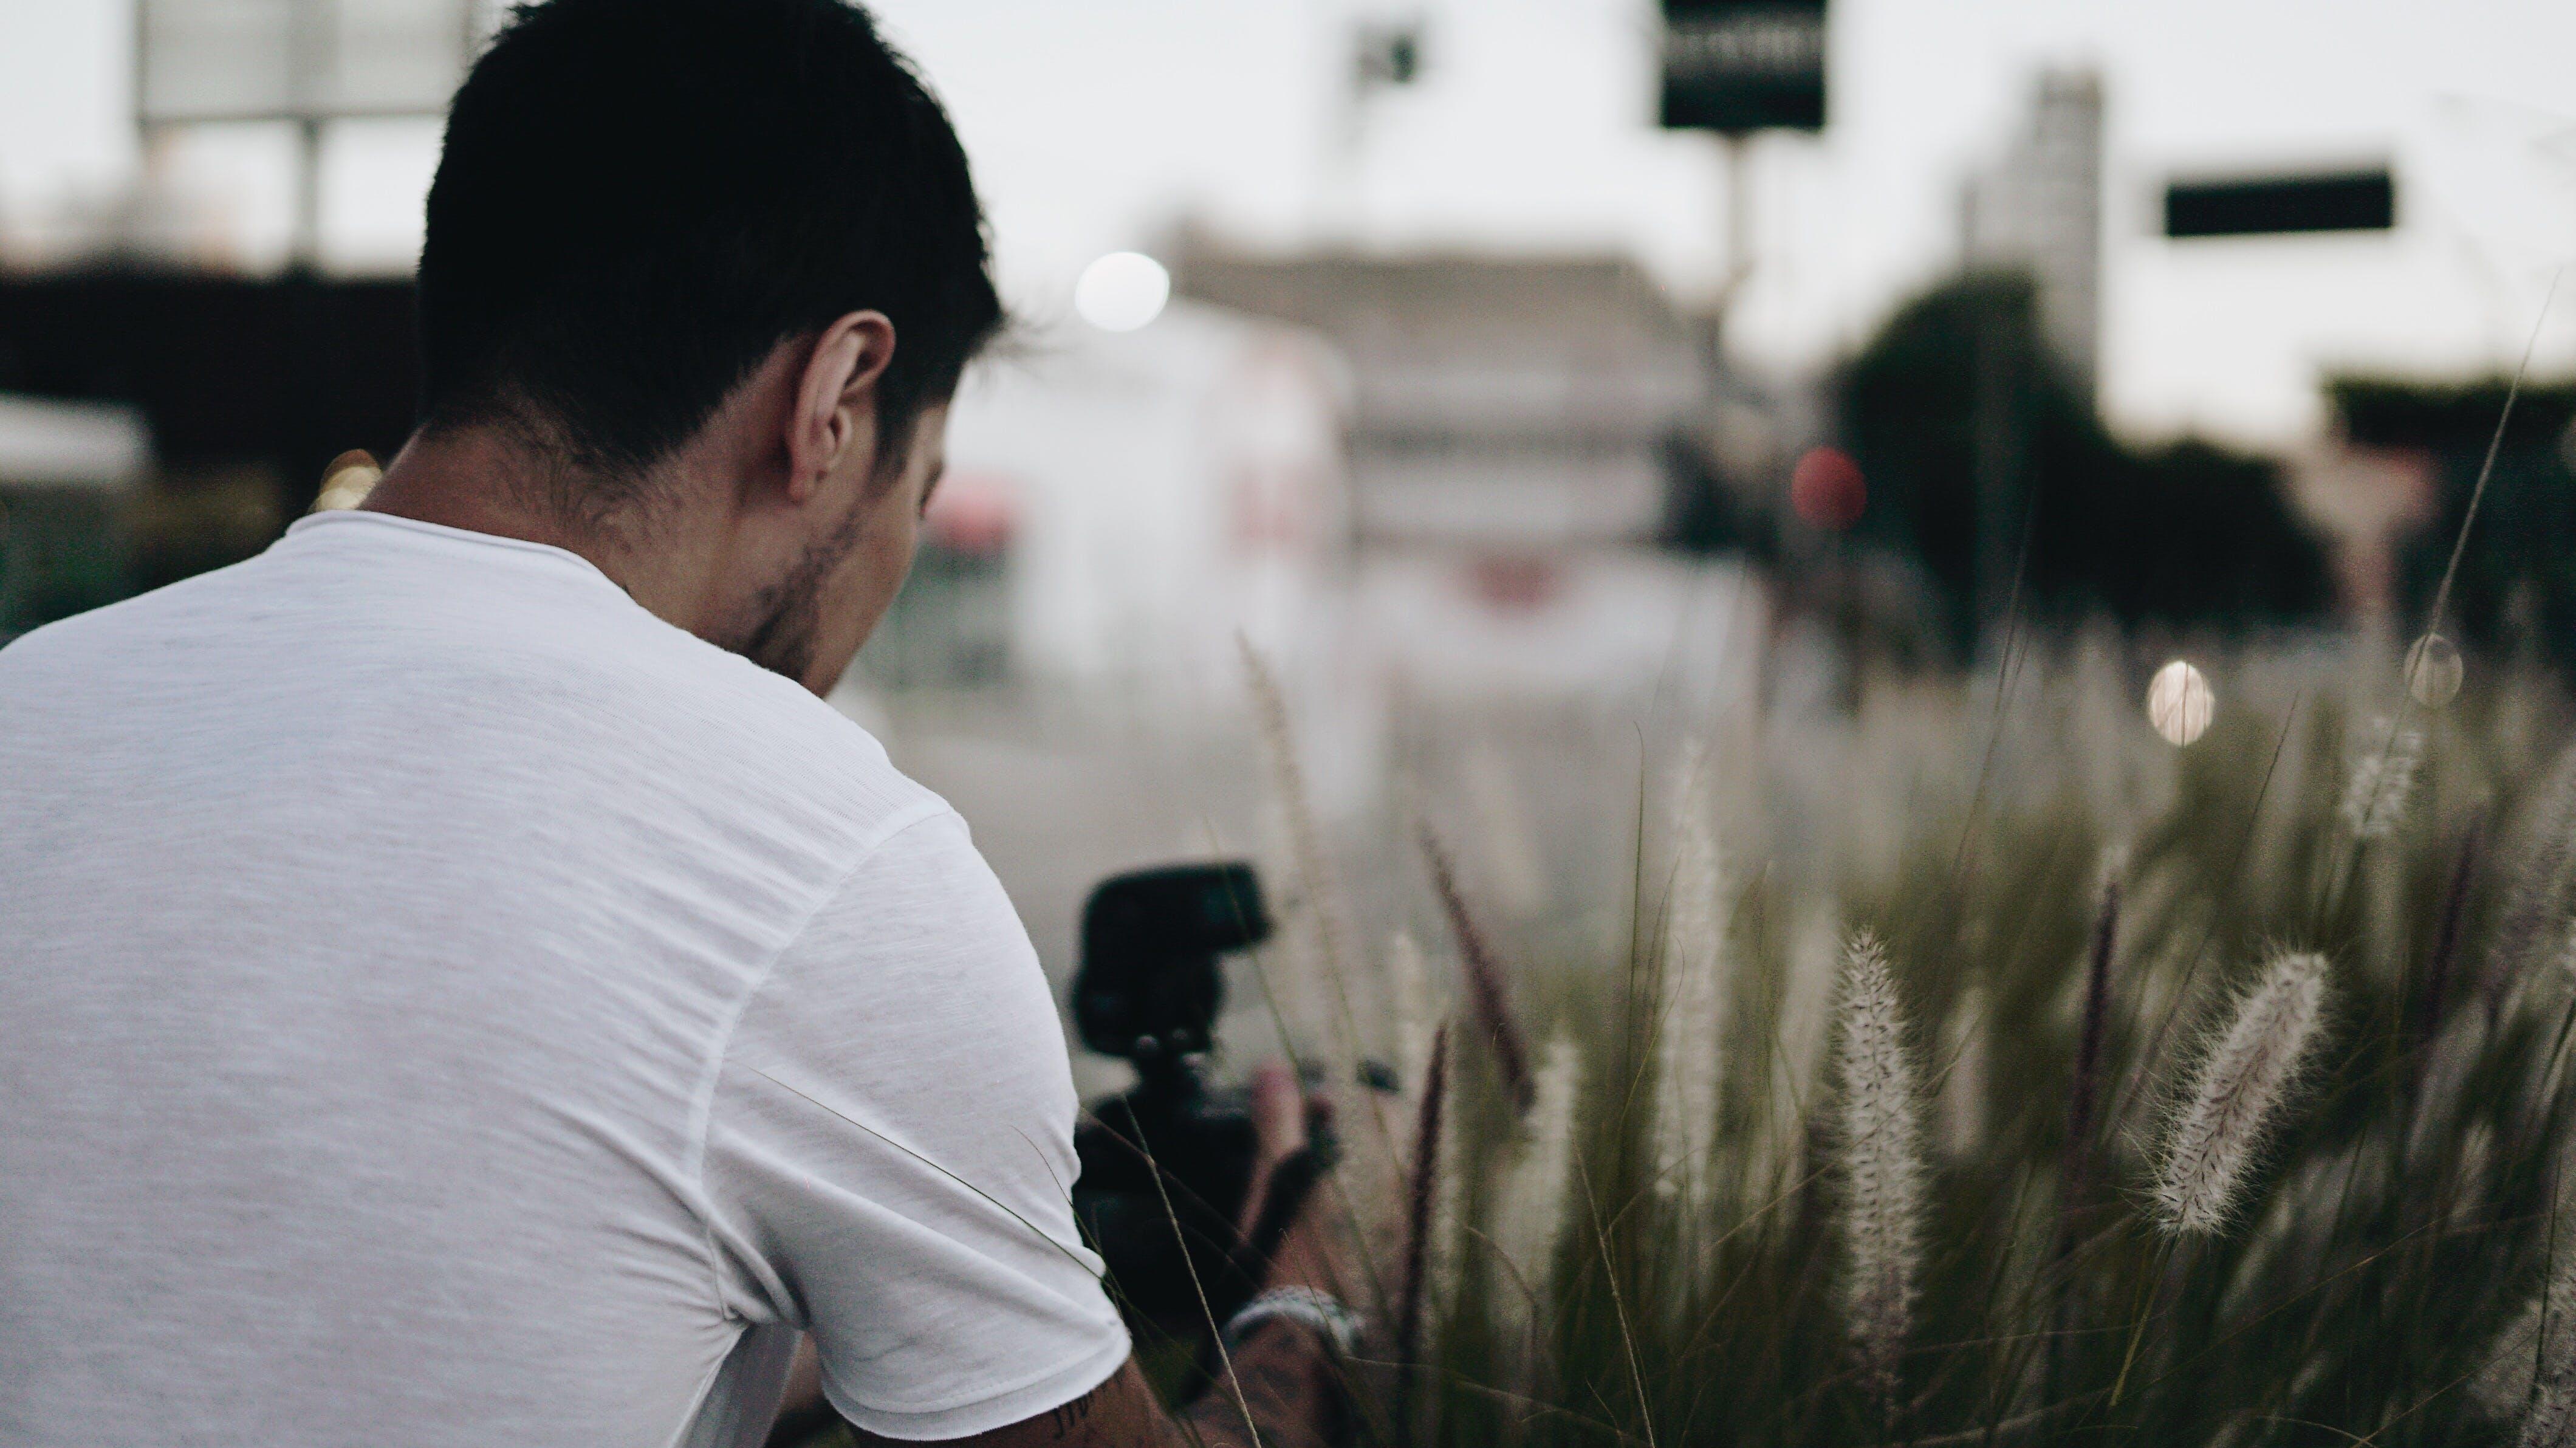 filmemacher, fotograf, kerl